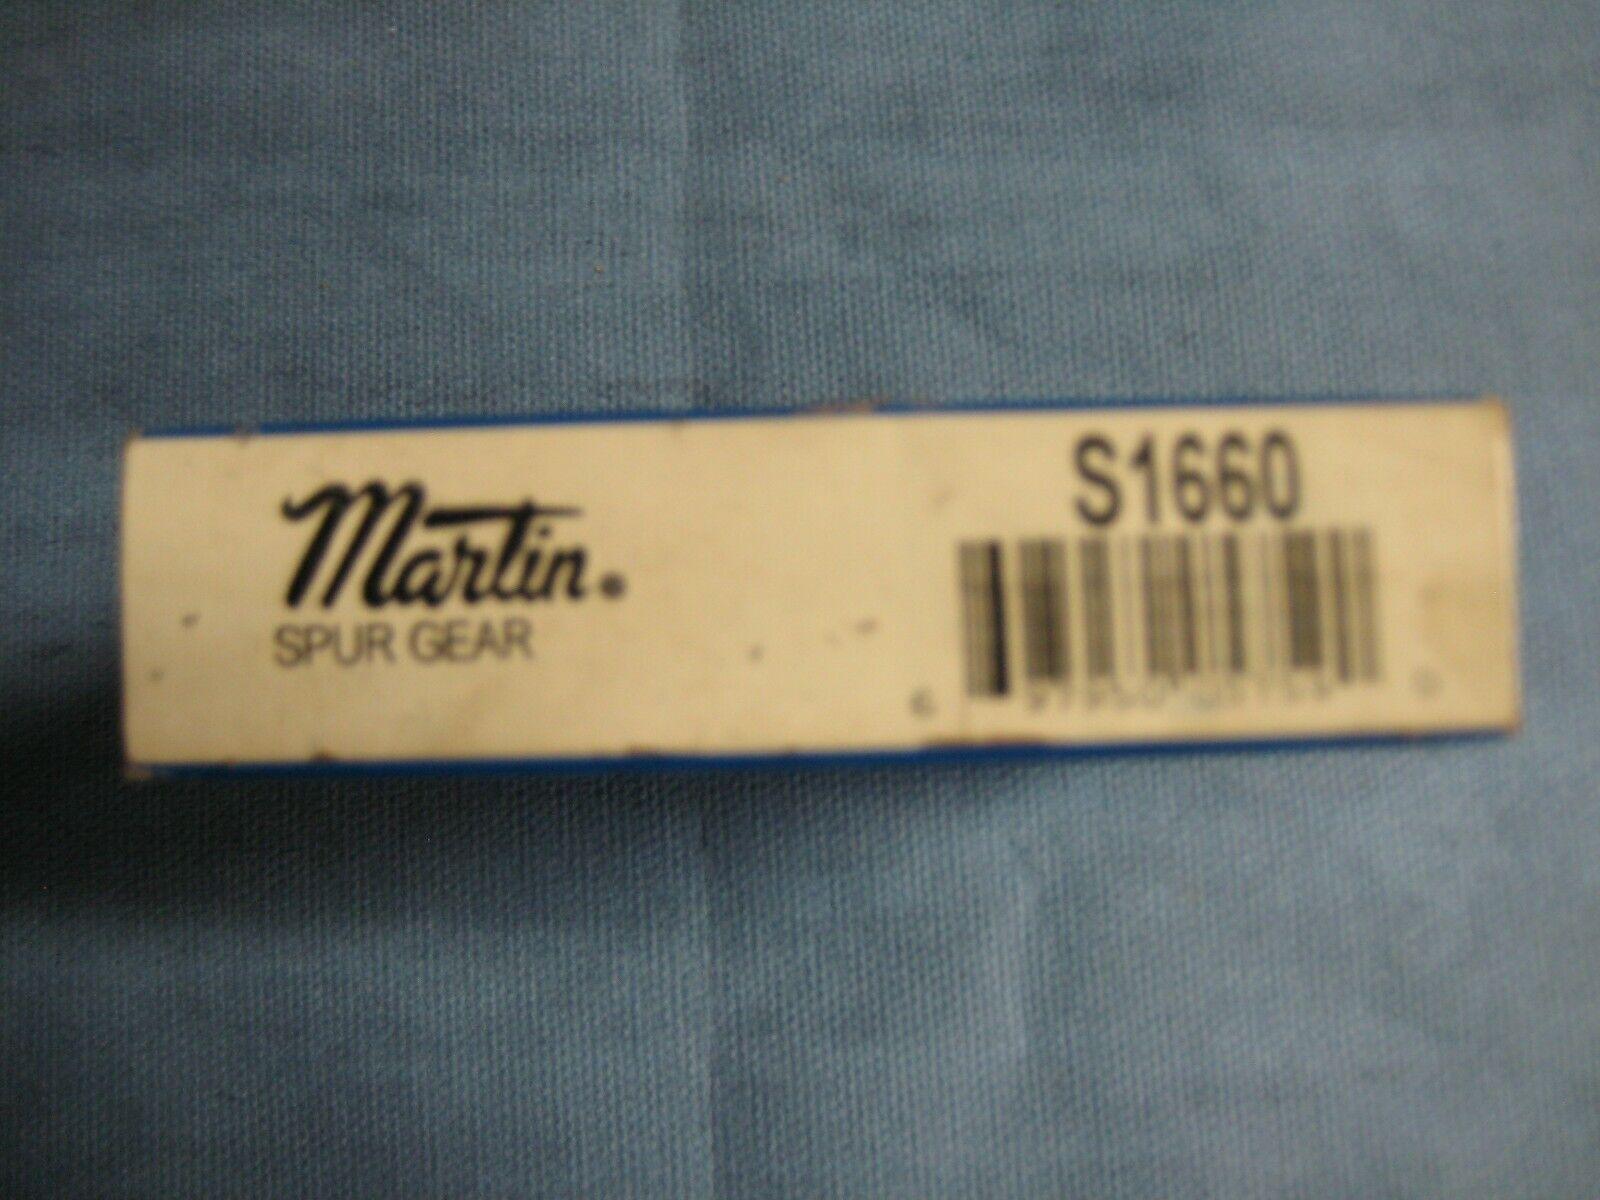 Martin S1660 Spur Gear (60 Tooth, 16 DP, 14-1 2 Deg. PA)